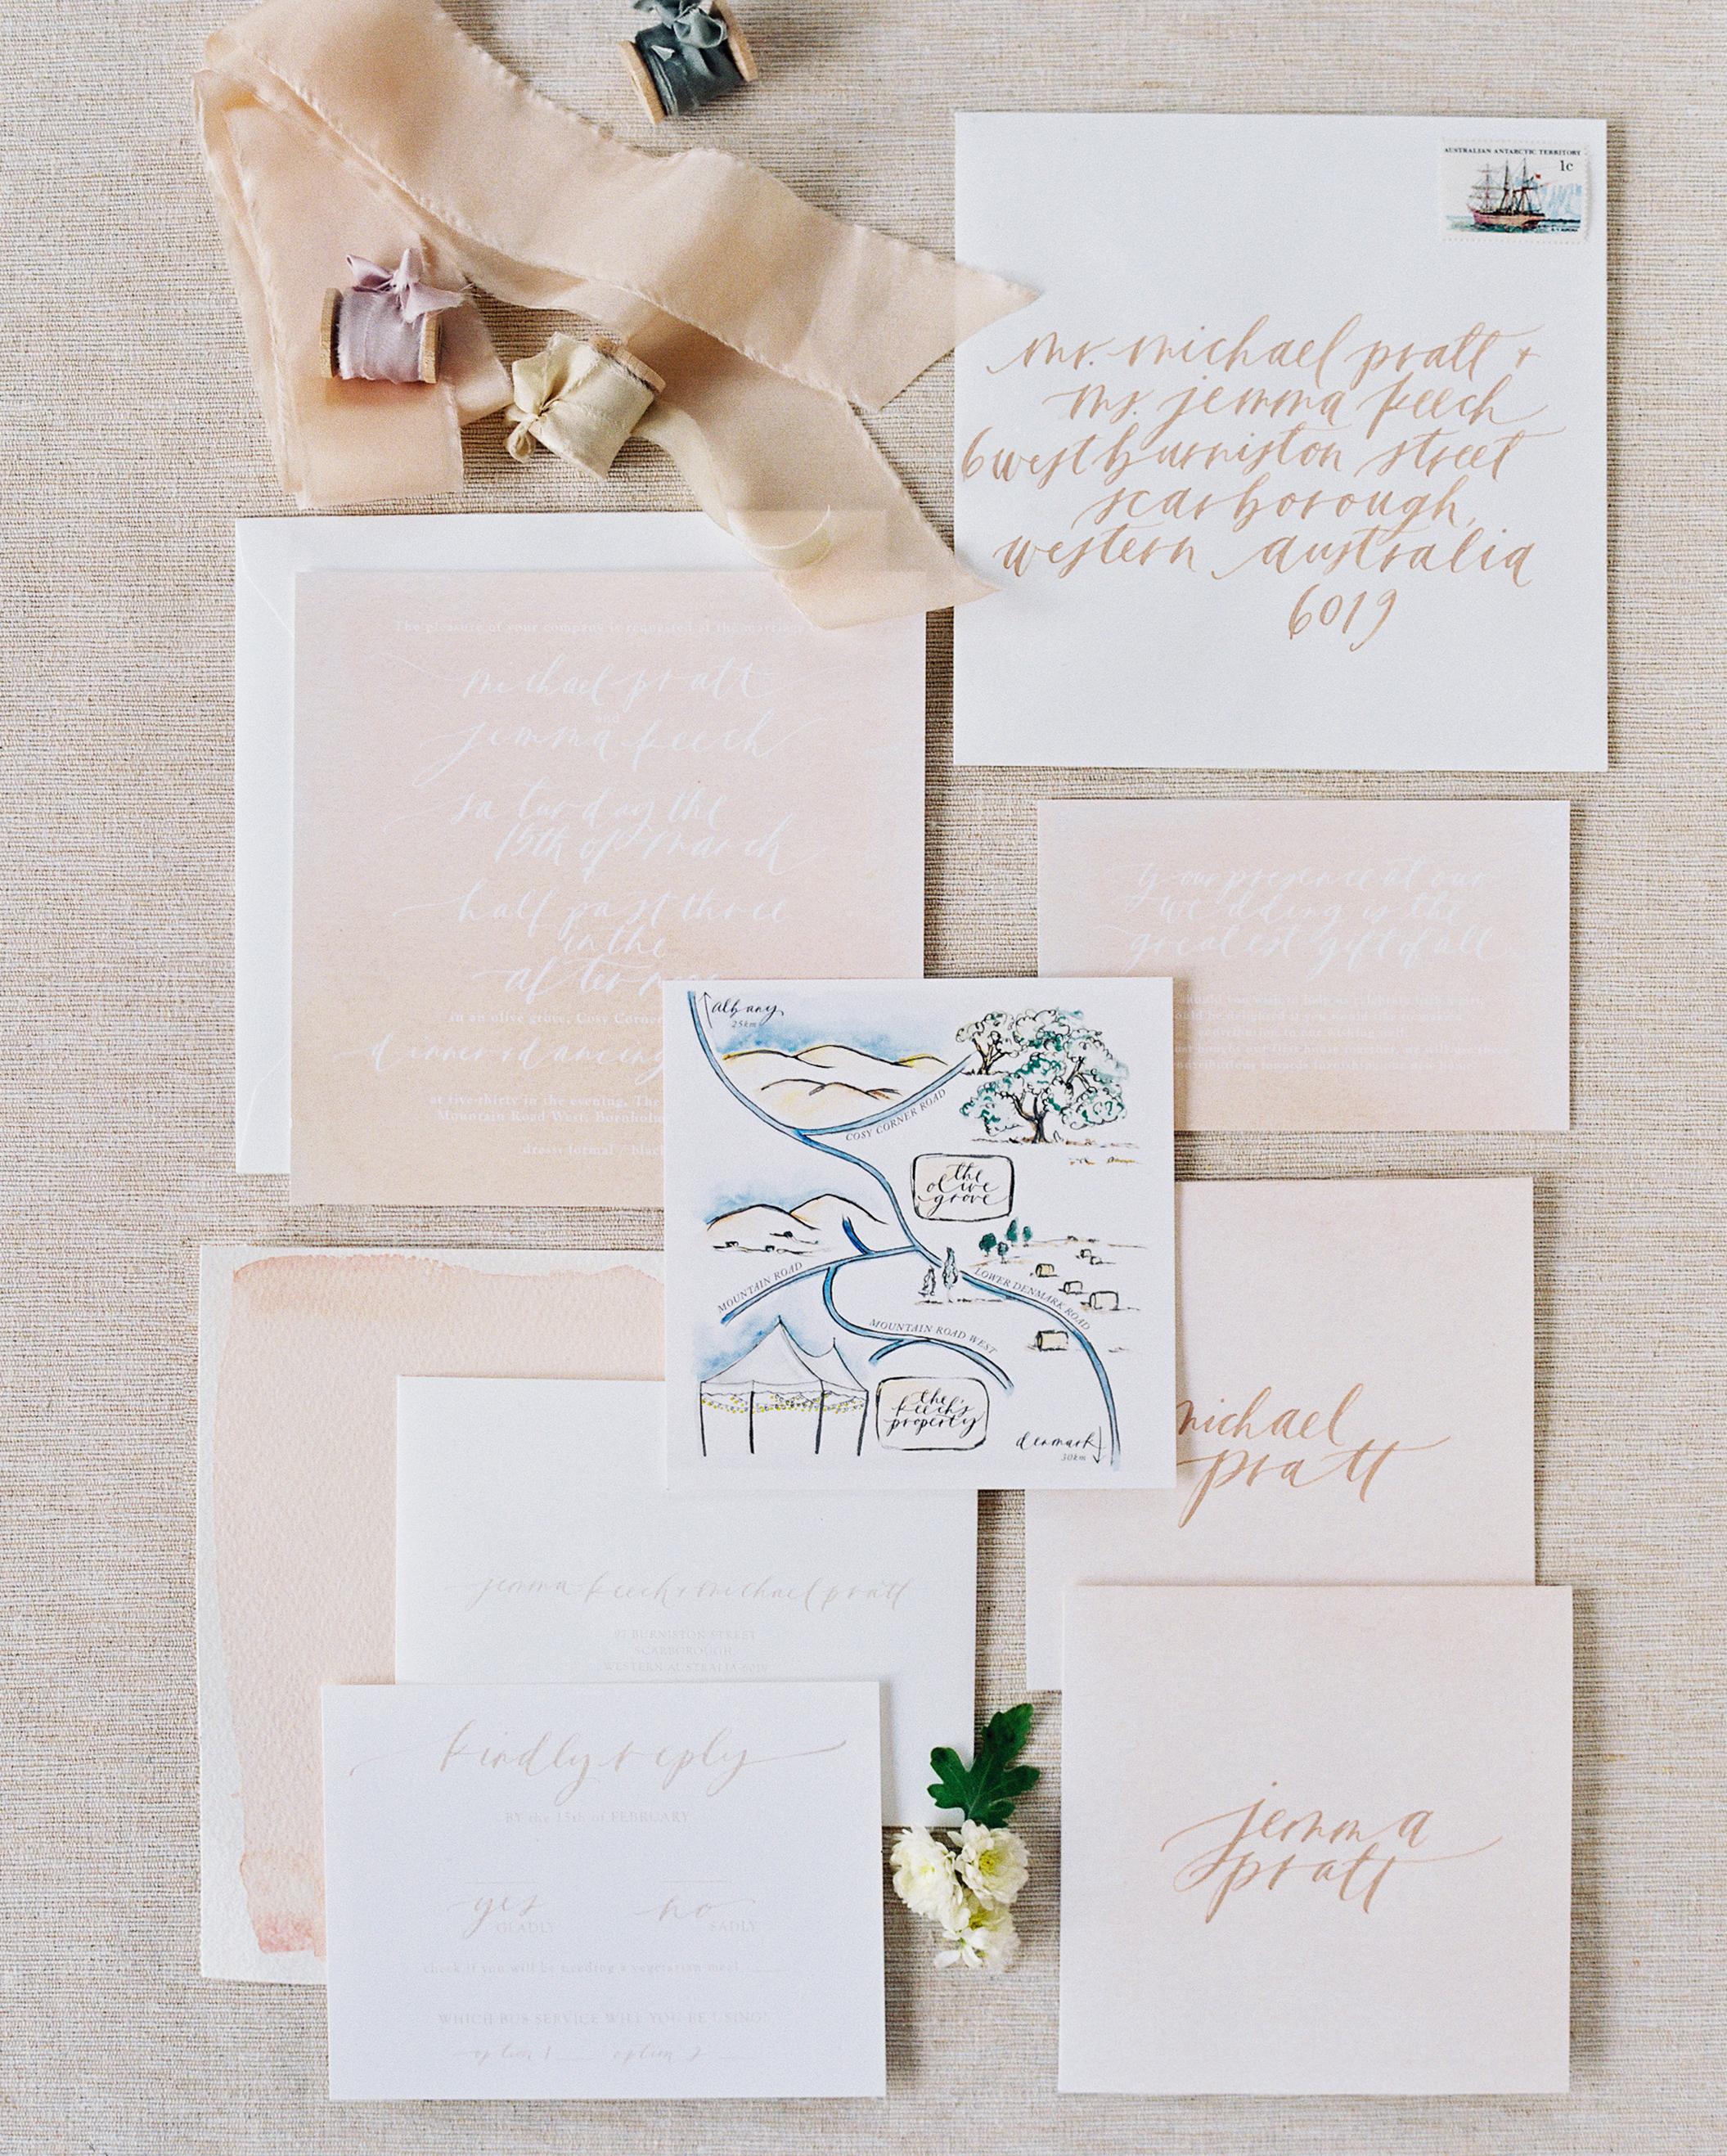 jemma-michael-wedding-stationery-002636007-s112110-0815.jpg